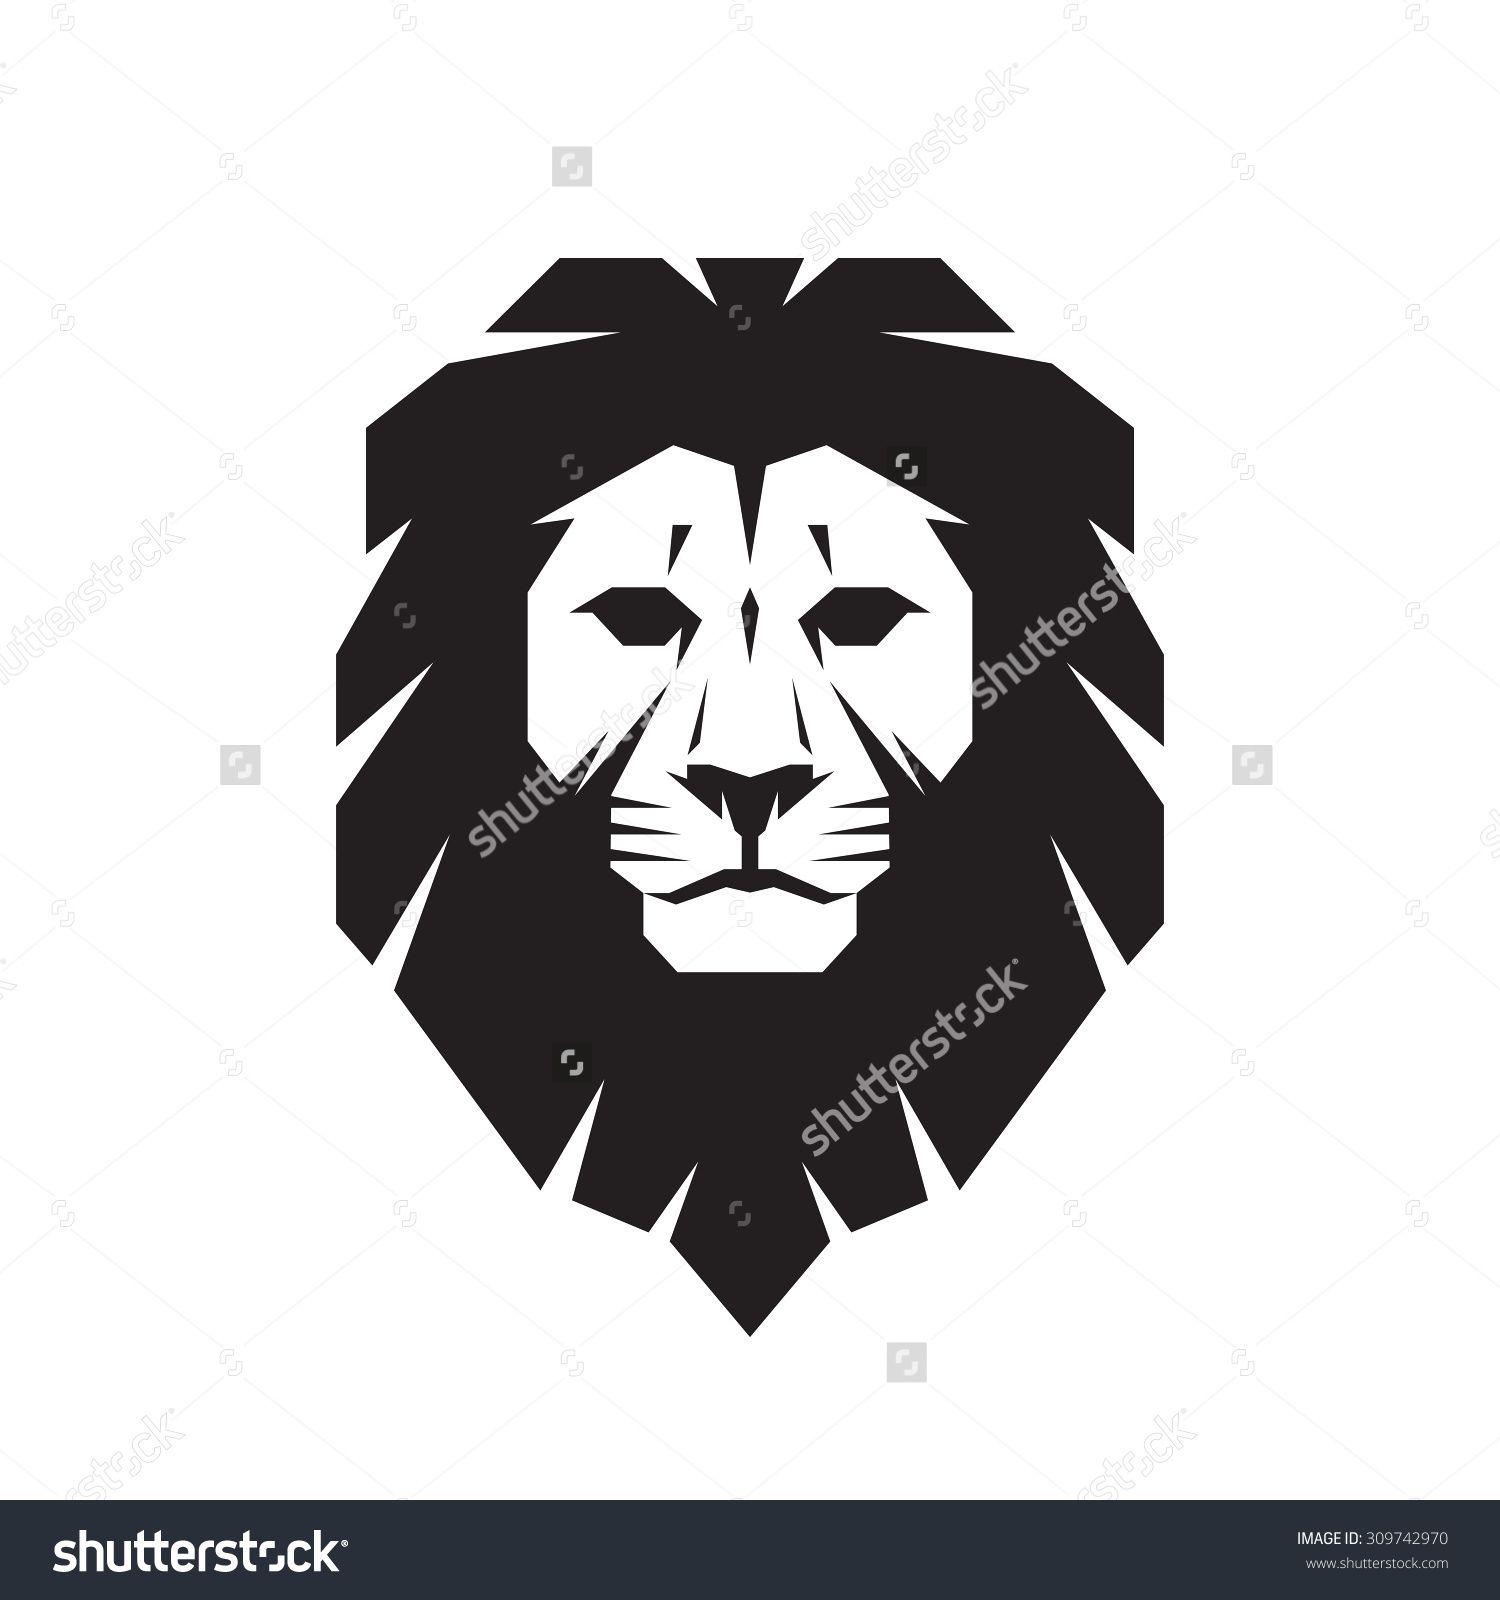 6c88bfa1a59e0 Lion Head - Vector Sign Concept Illustration. Lion Head Logo. Wild Lion Head  Graphic Illustration. Design Element. - 309742970 : Shutterstock